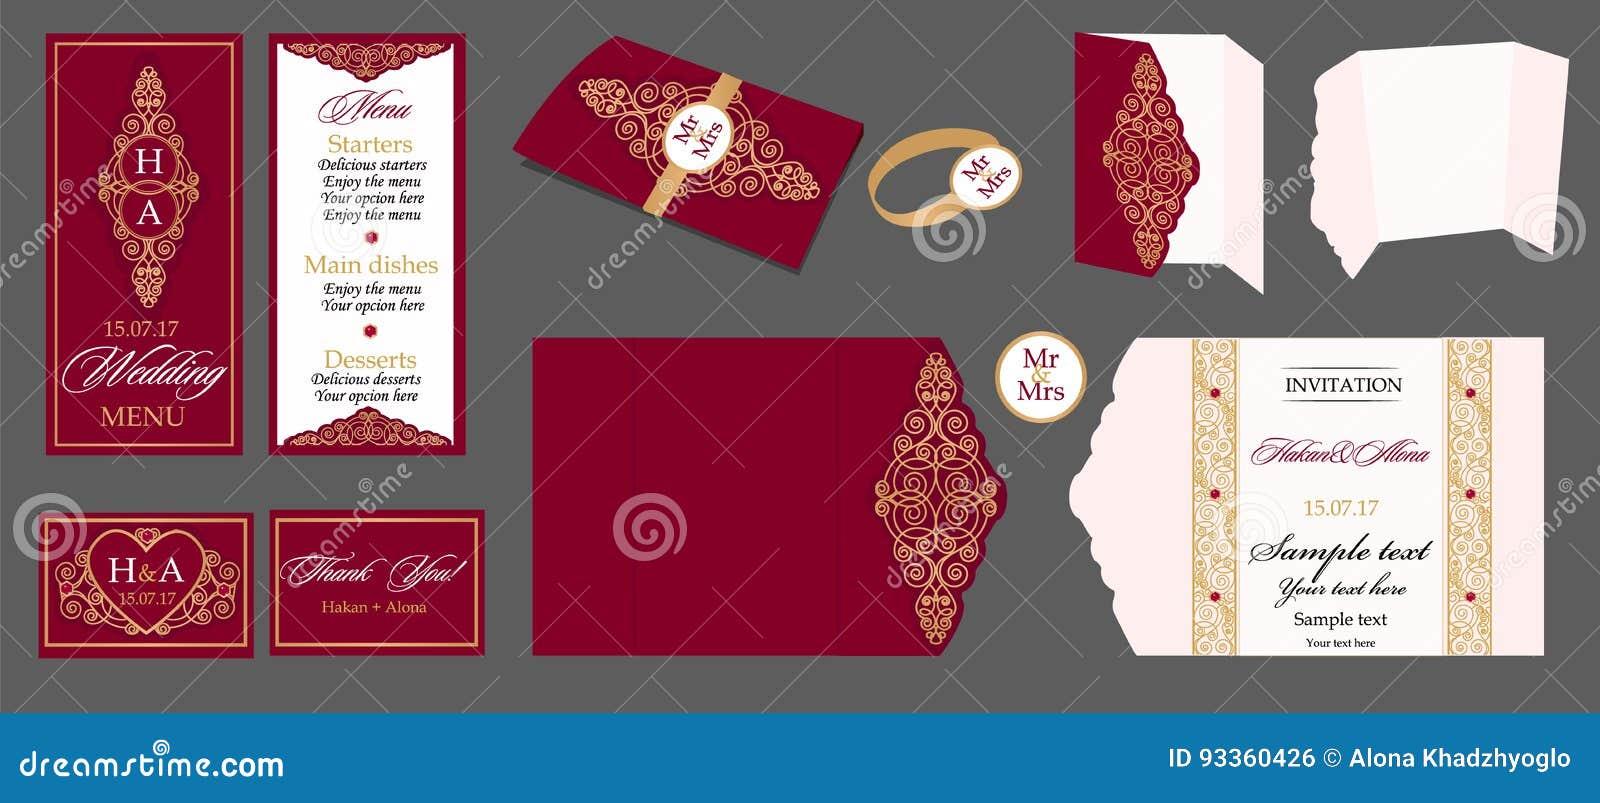 Wedding Card Collection - Menu, Bar Menu, Invitation, Table Cards ...